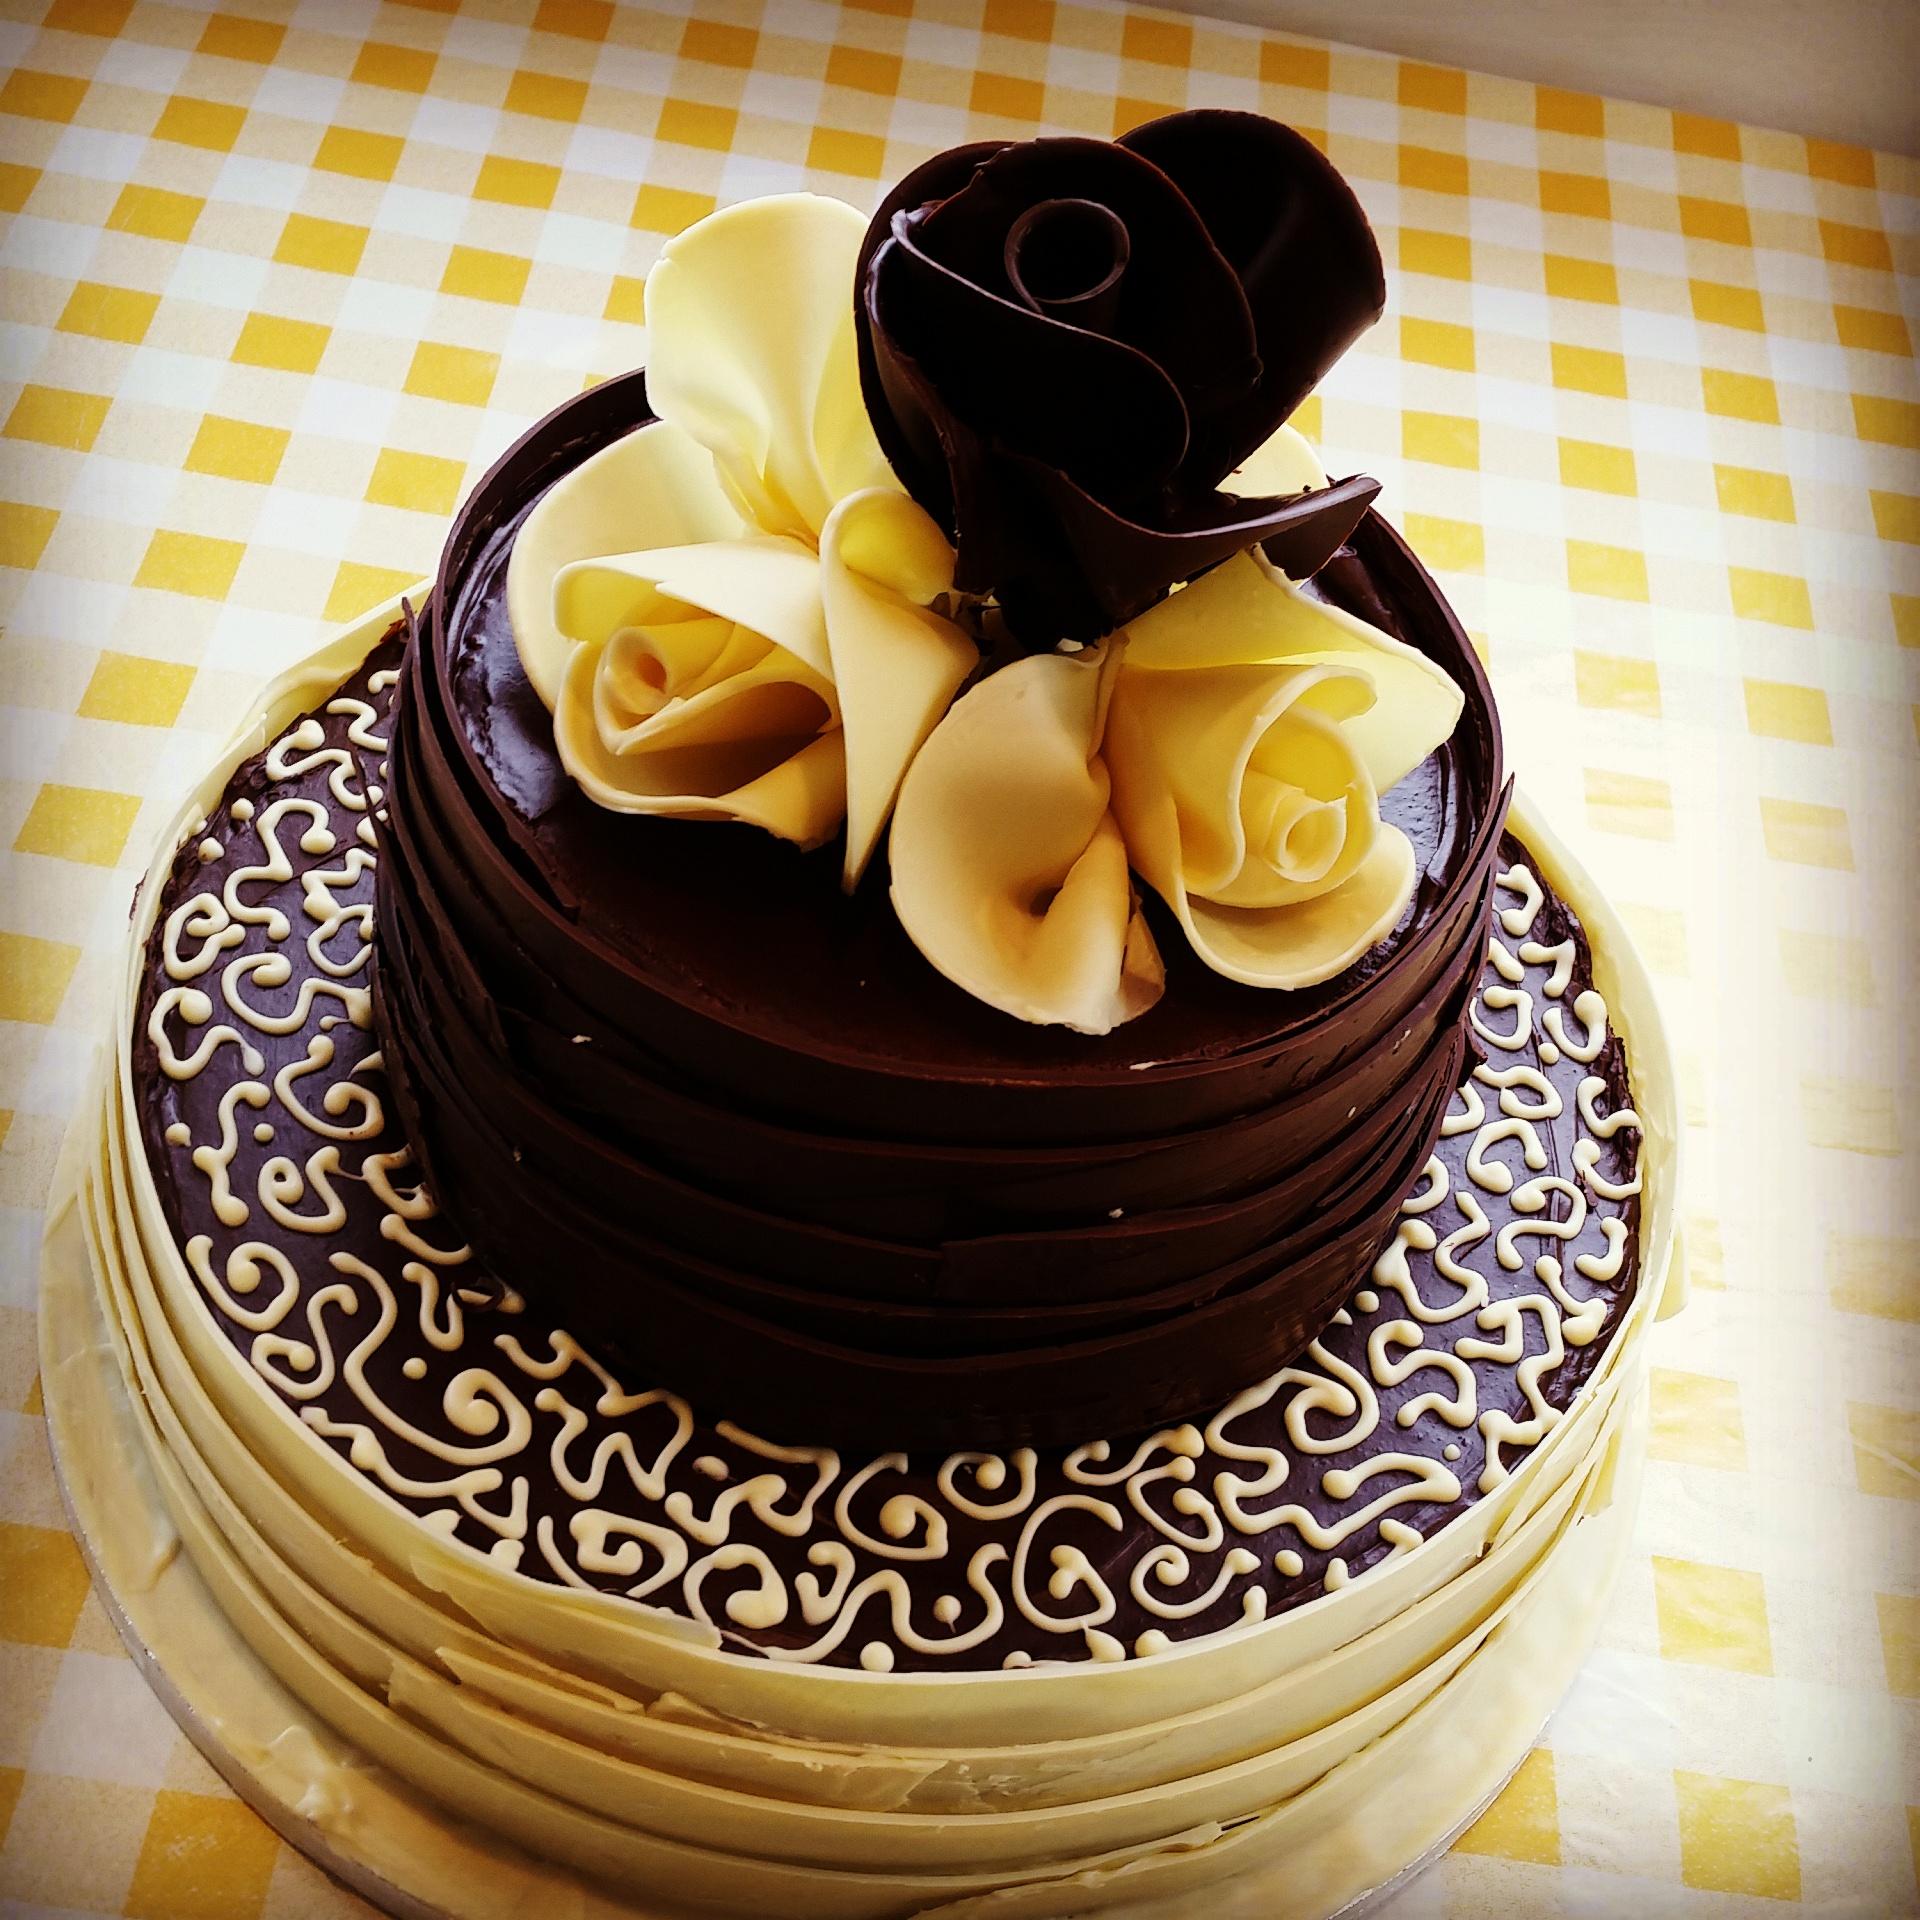 Chocolate roses and wedding cake